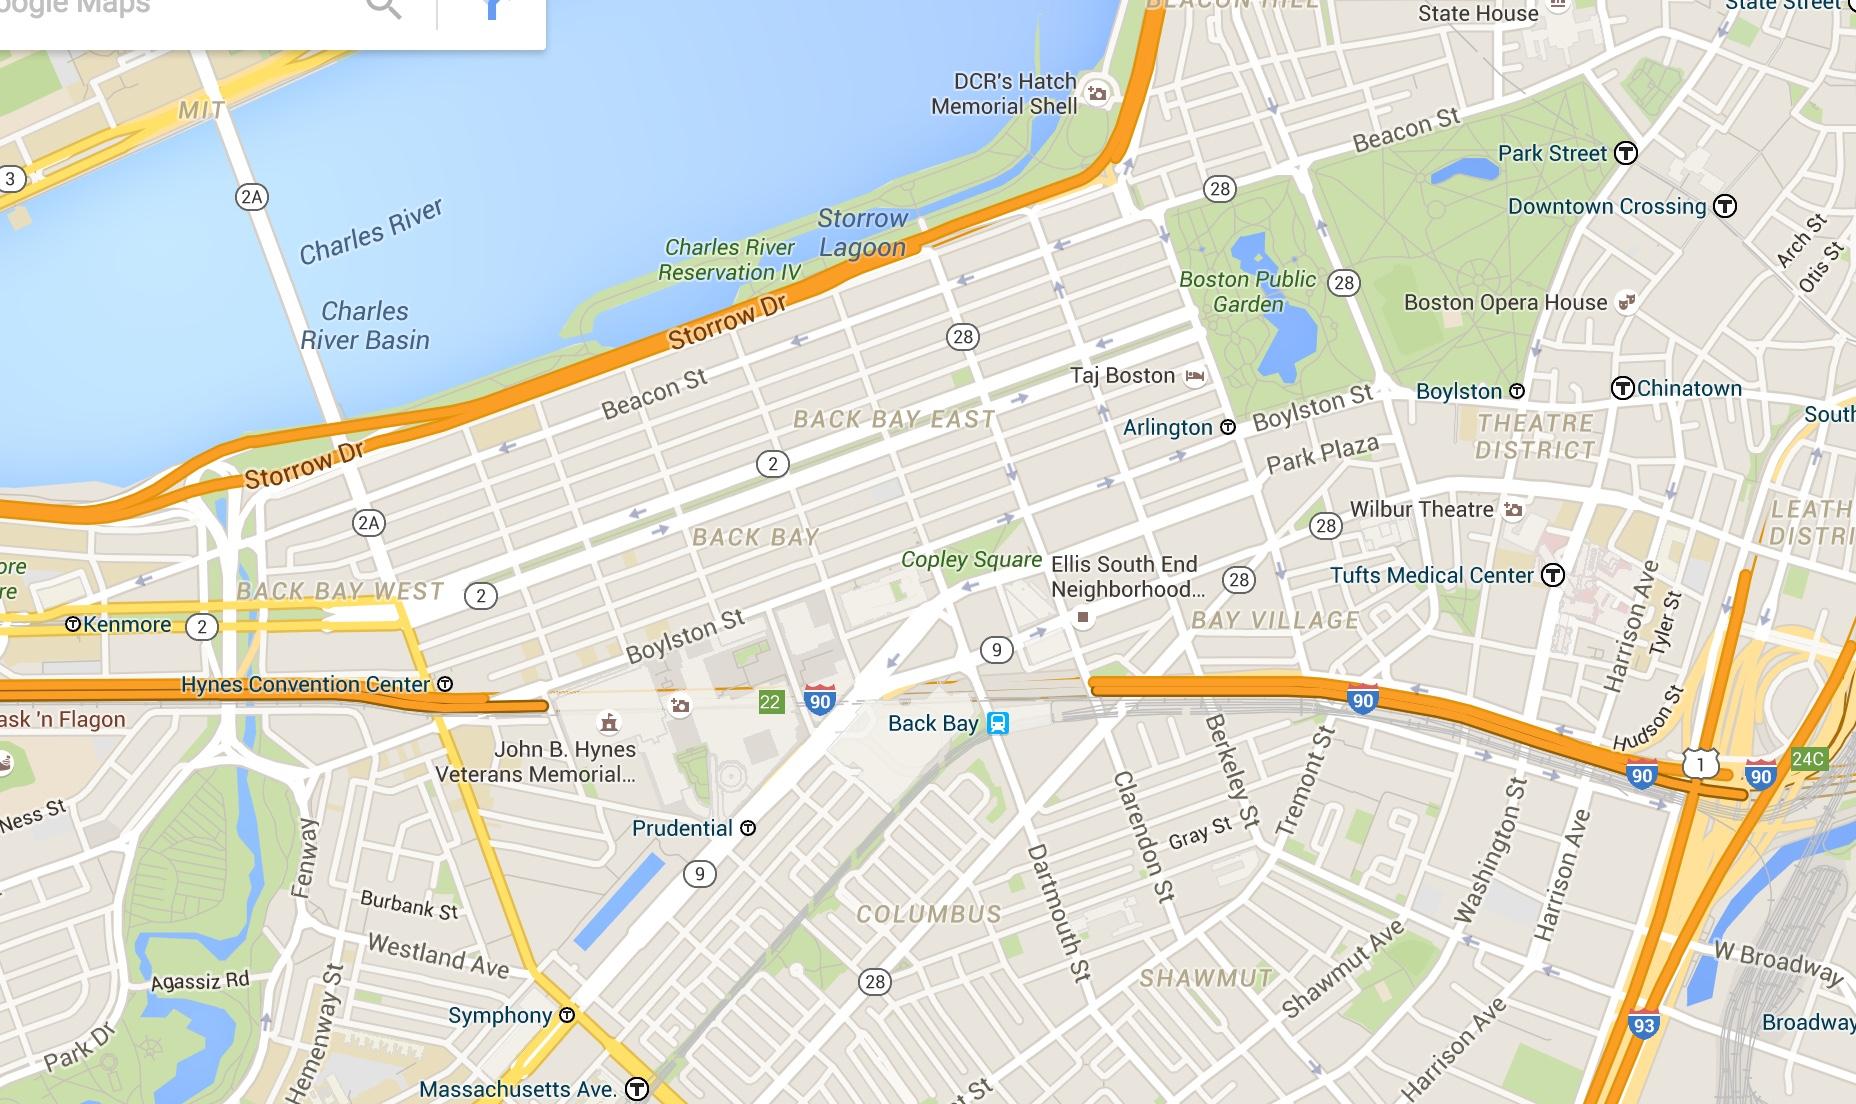 map copley square boston Google Map Emerald Necklace Copley Square And Boston Commons The Urban Imagination map copley square boston